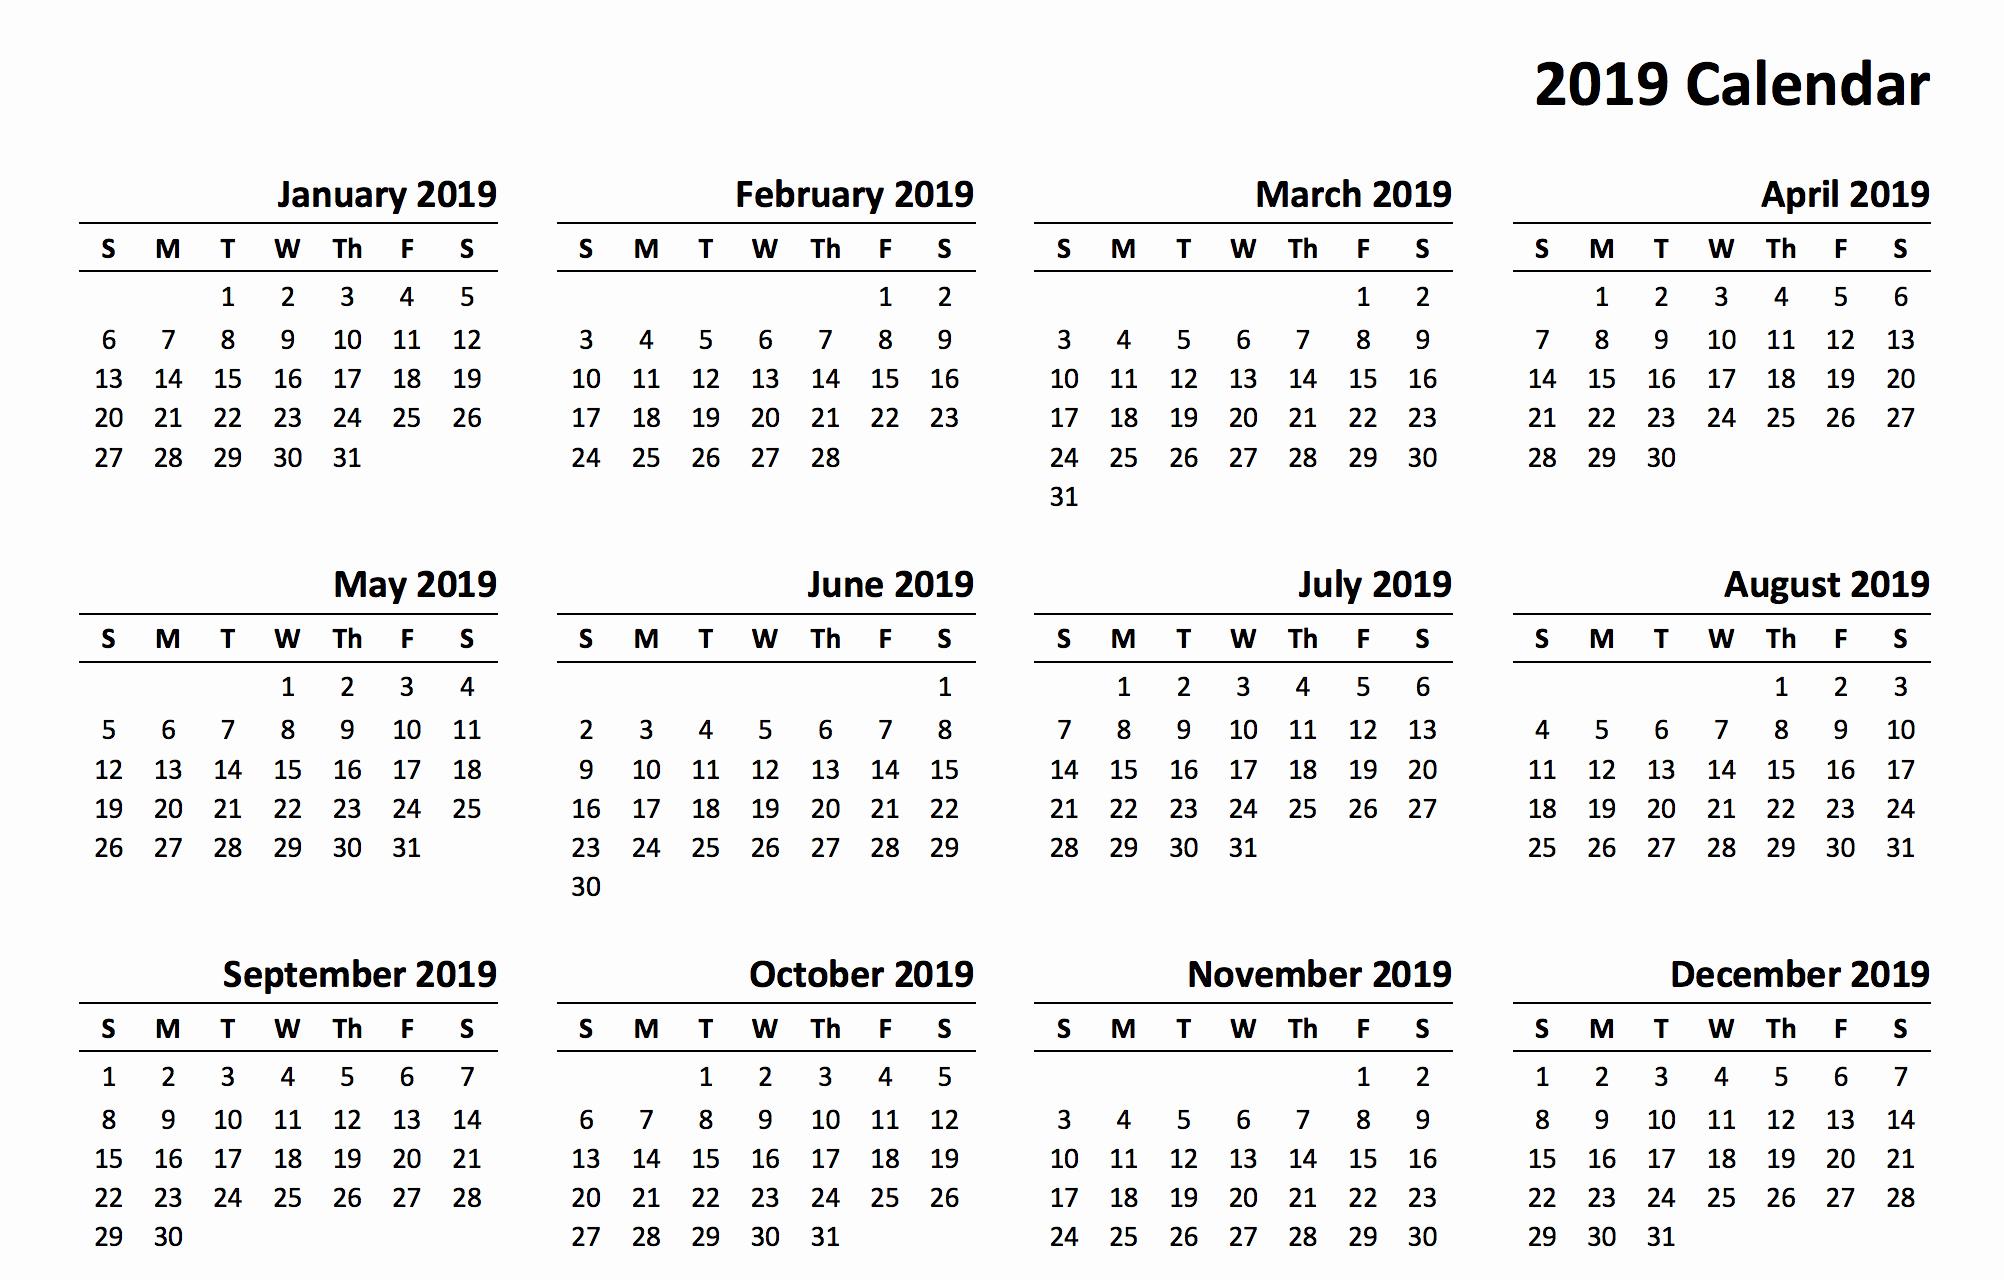 2019 Monthly Calendar Template Inspirational 2019 Calendar Amazonaws